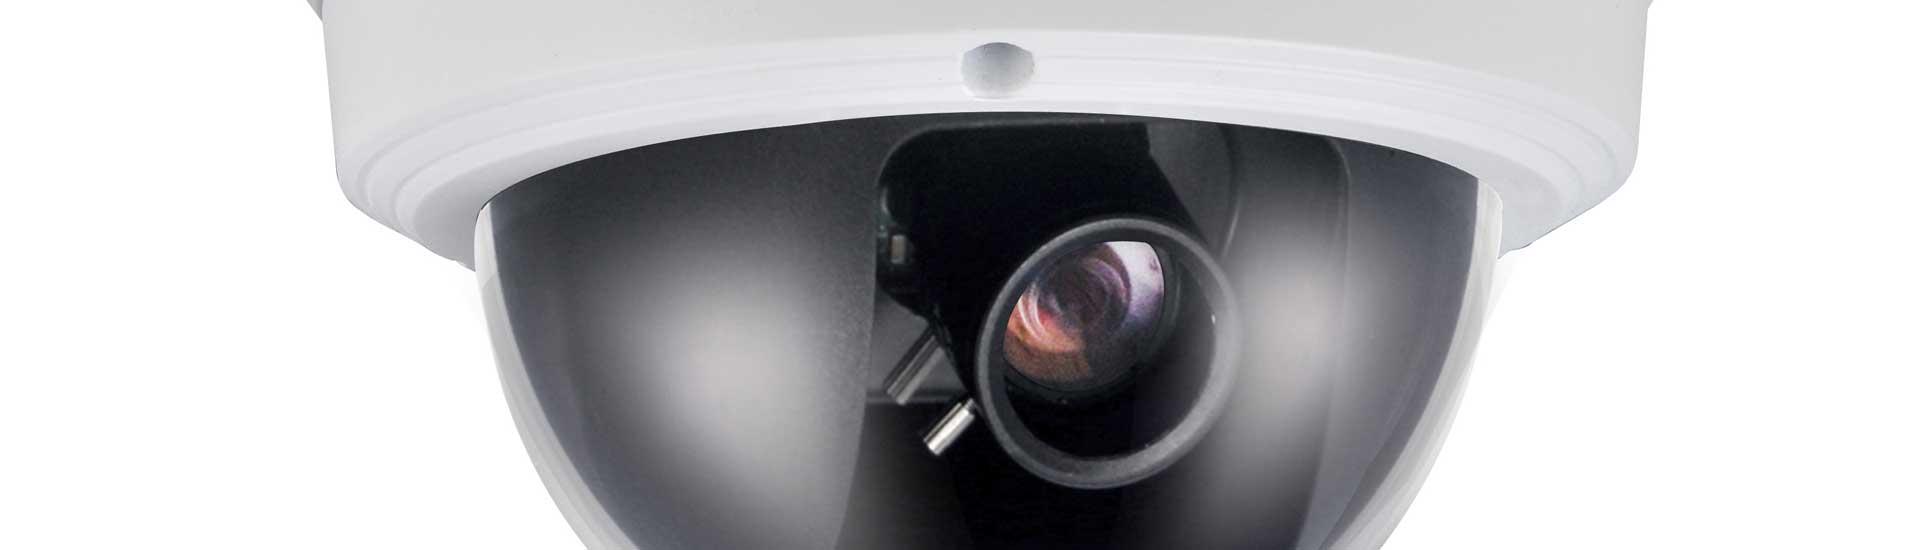 Société d'installation de vidéosurveillance